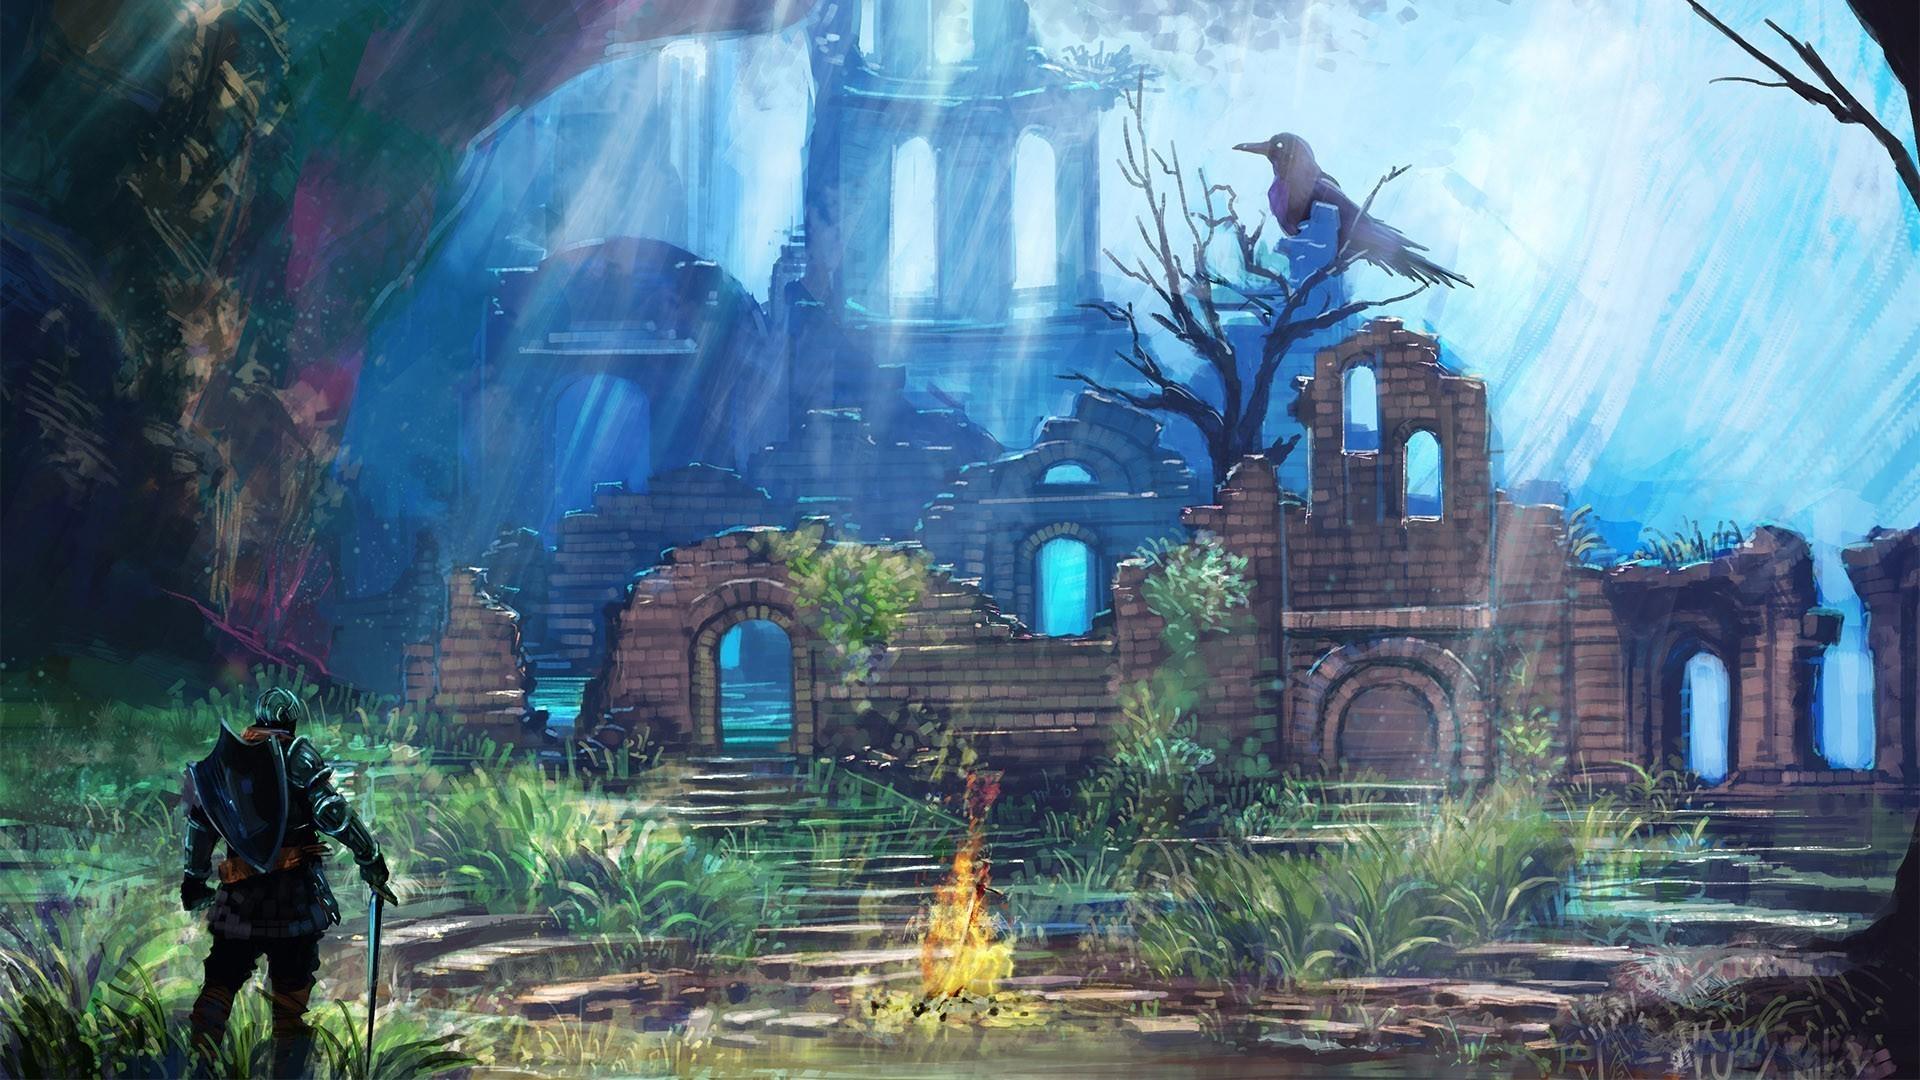 Dark Souls Wallpapers : 20 Best Dark Souls 2 & Dark Souls 3 .